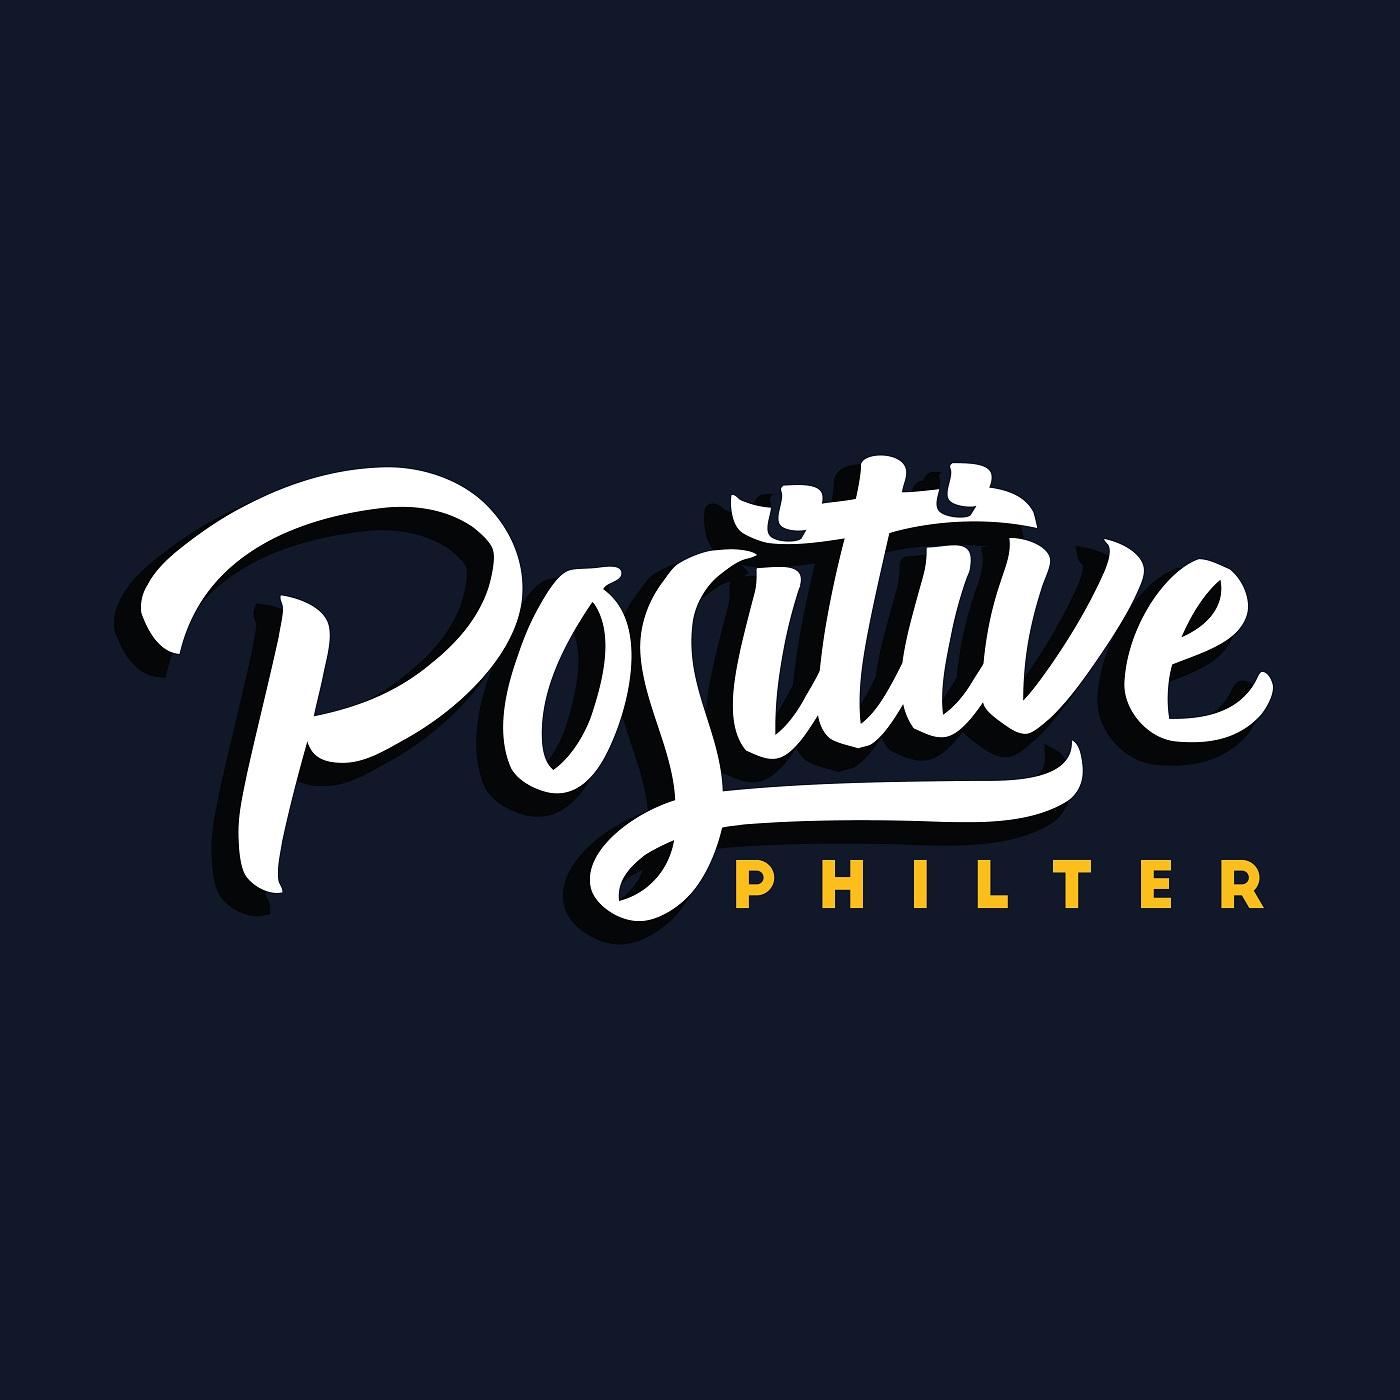 Positive Philter Podcast  logo